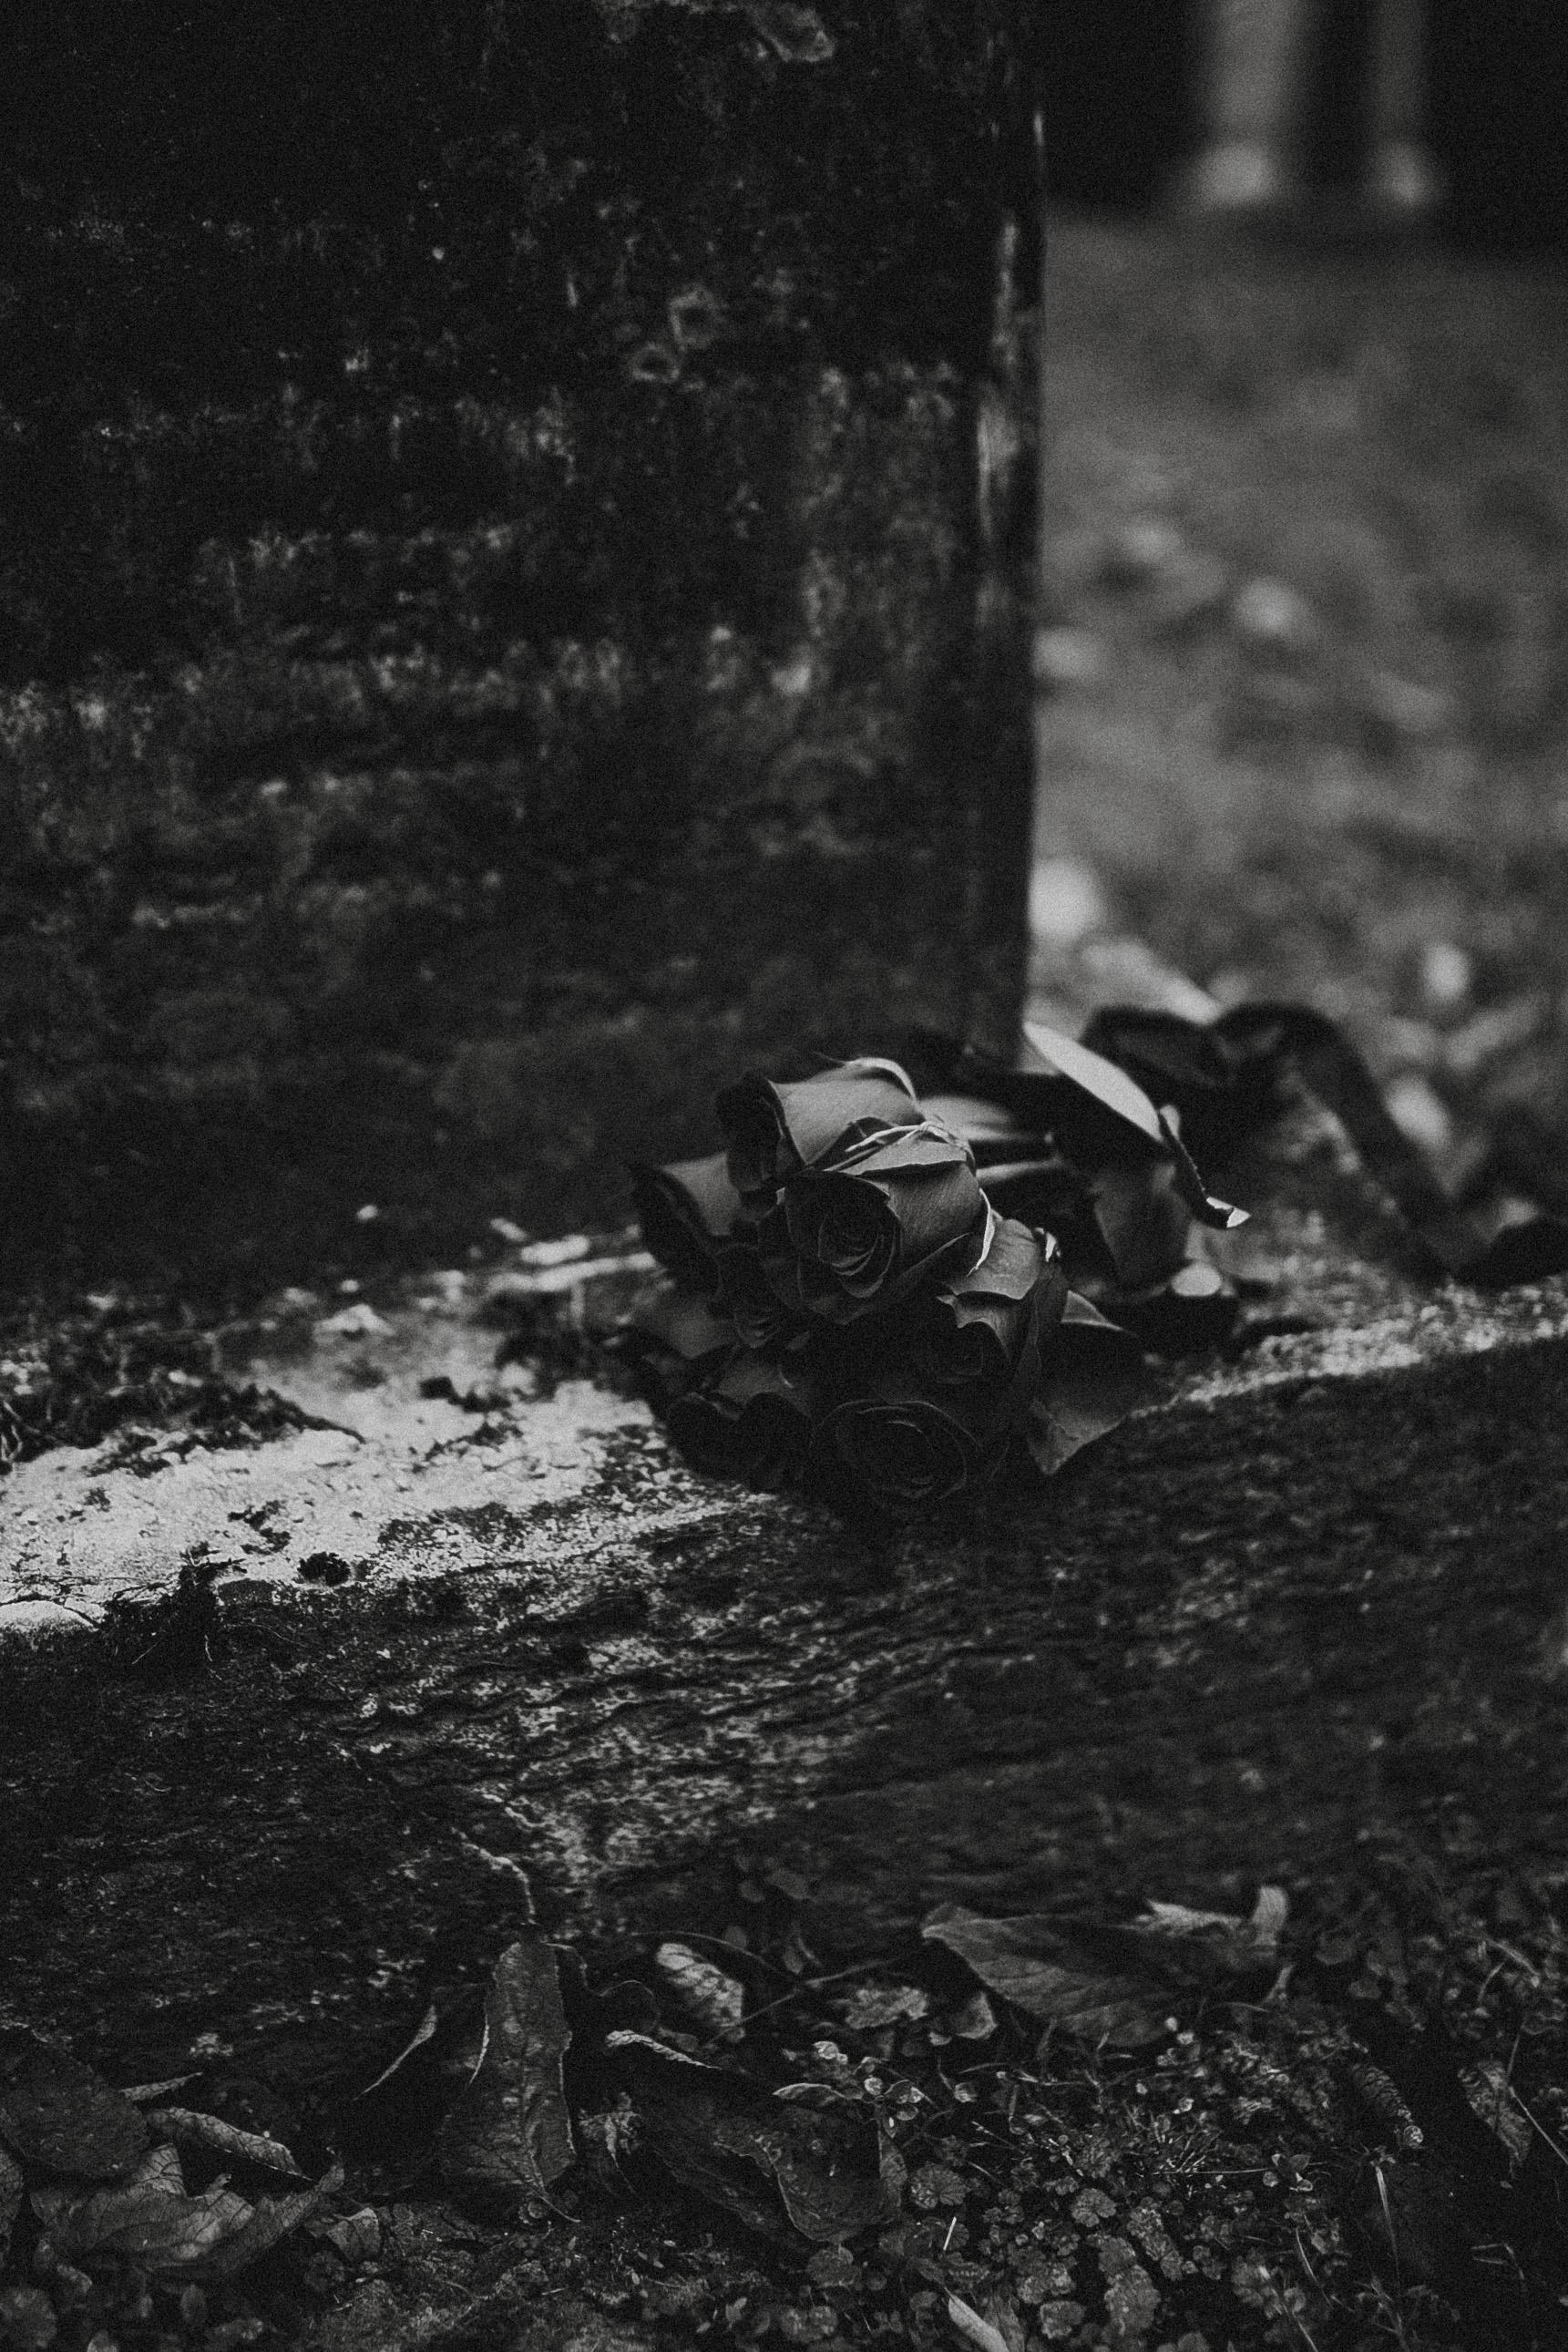 HALLOWEEN-REAGANLYNNPHOTOGRAPHY-INDIANAPOLIS-INDIANA-38.jpg